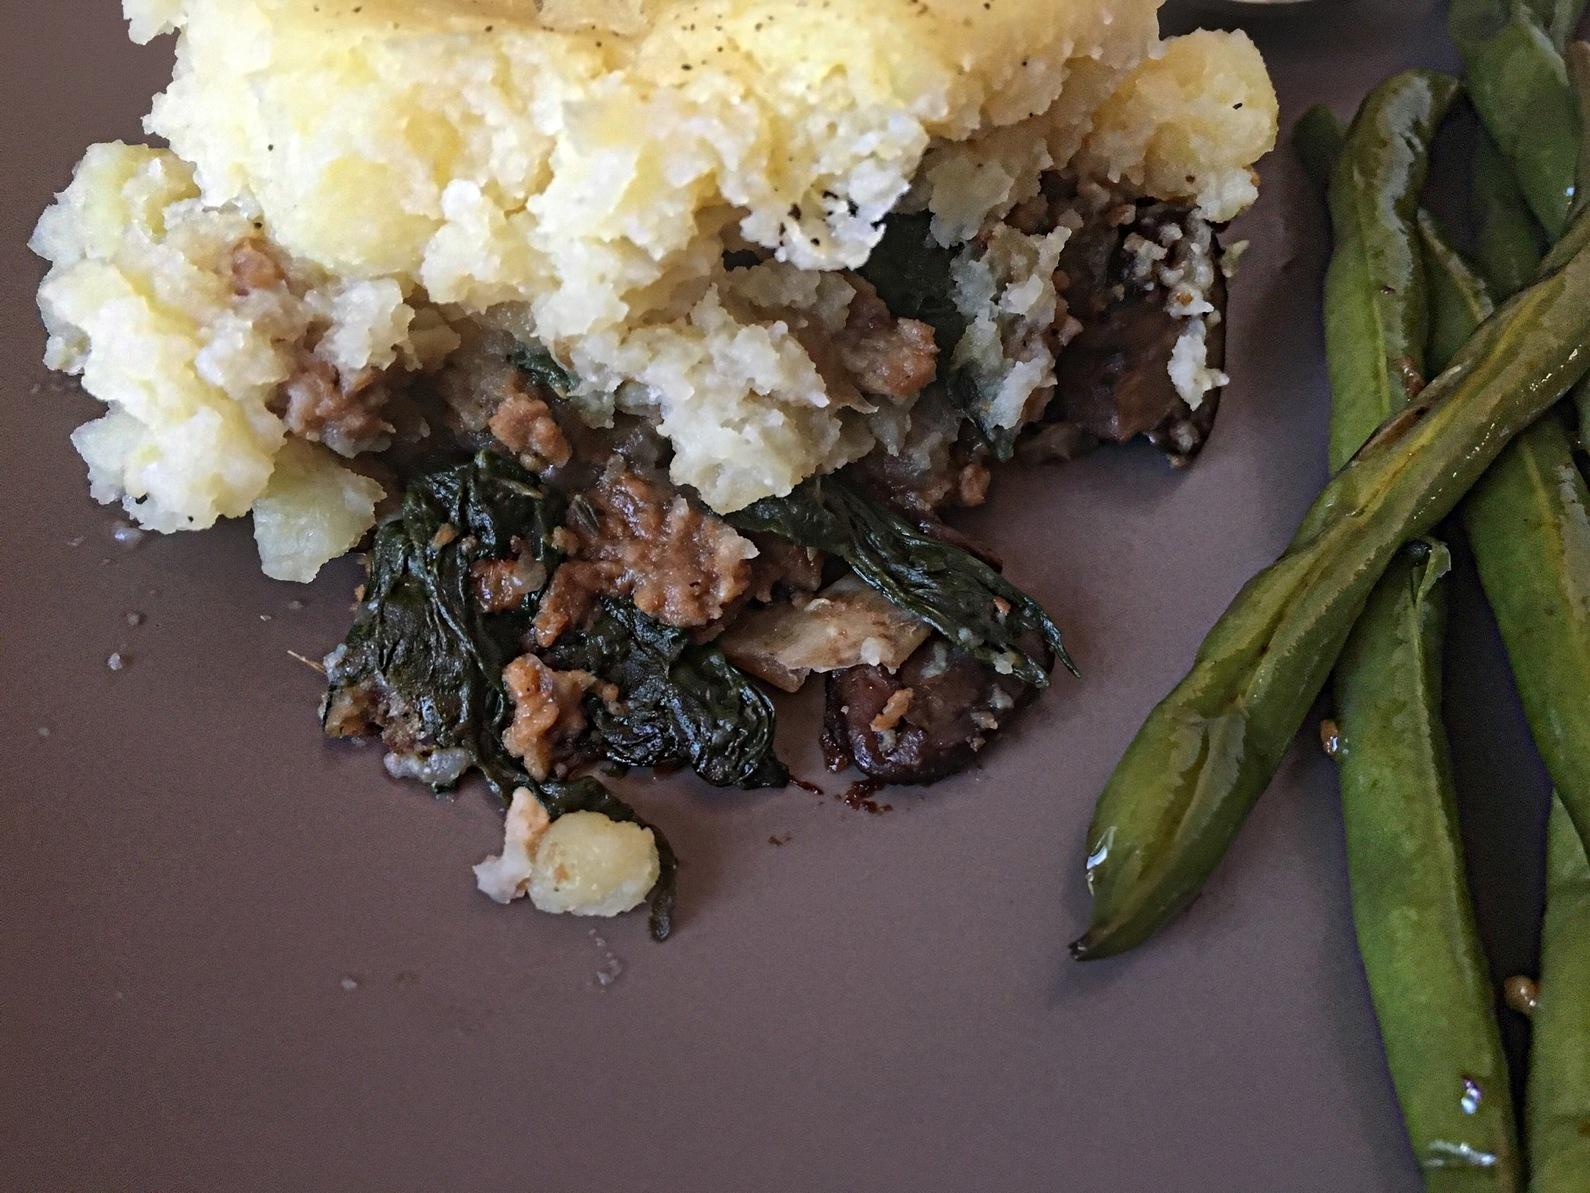 vegan shepherds pie with green beans